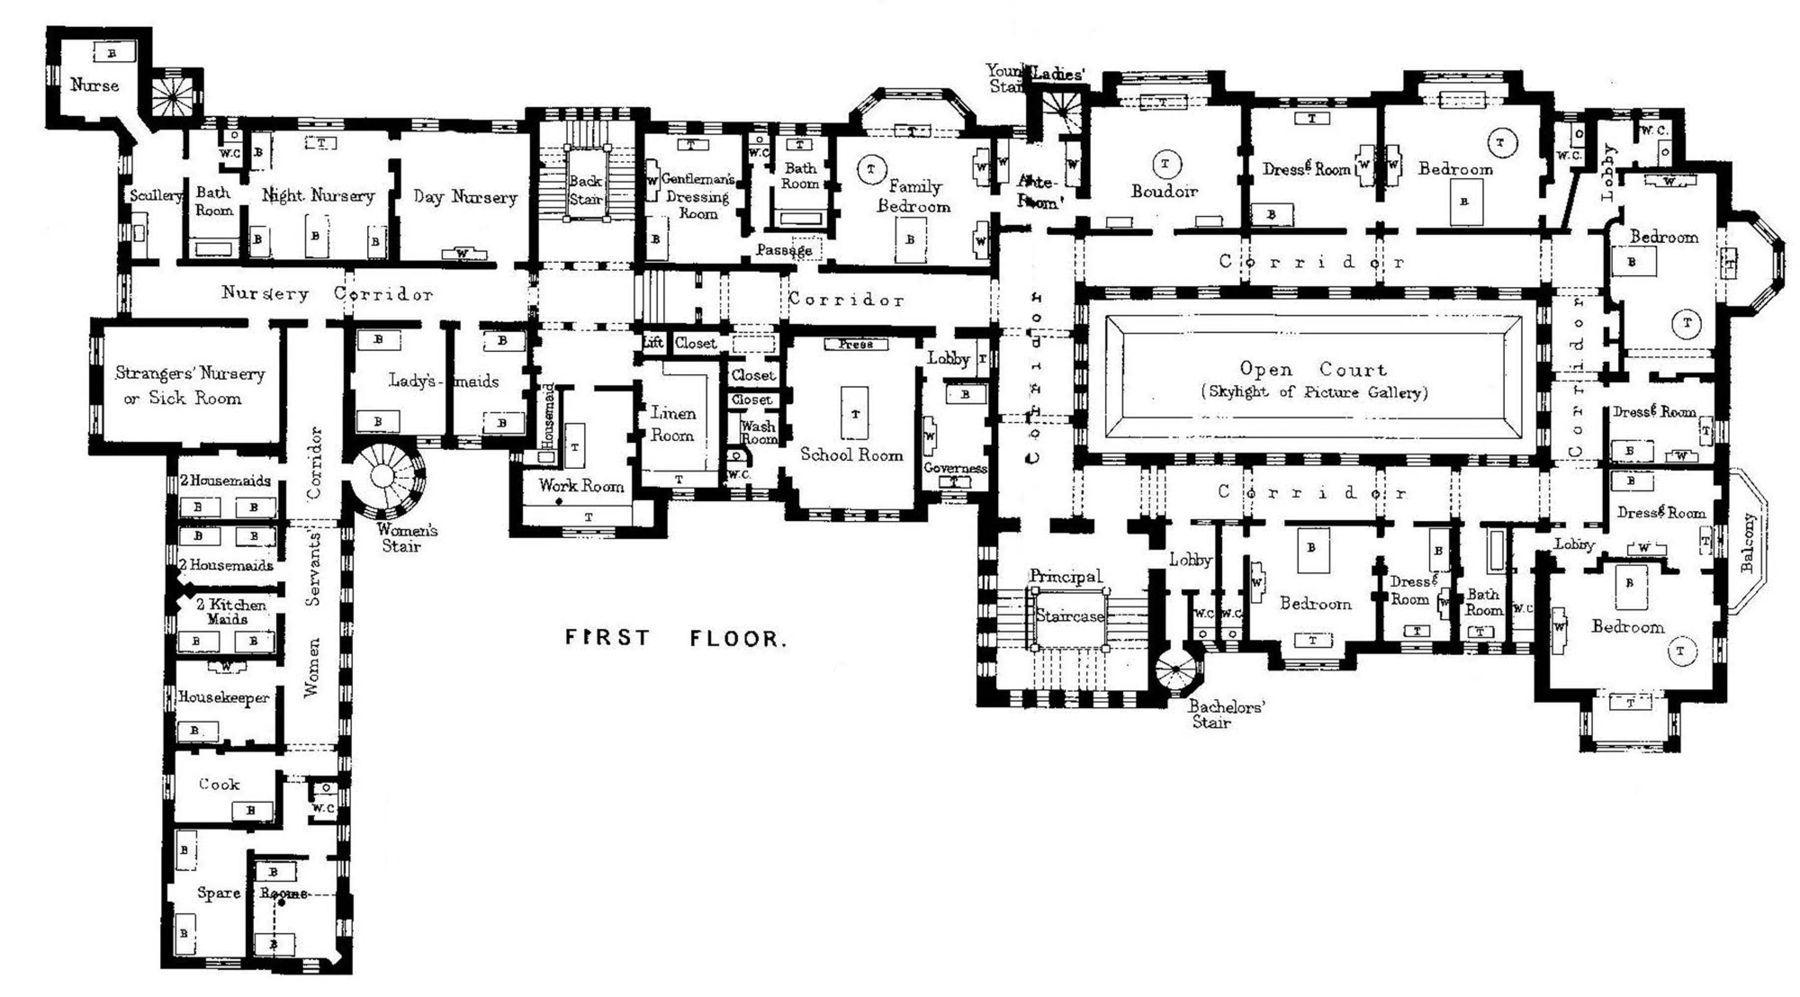 gilded age mansions floor plans www galleryhip com the floorplans for gilded age mansions skyscraperpage forum